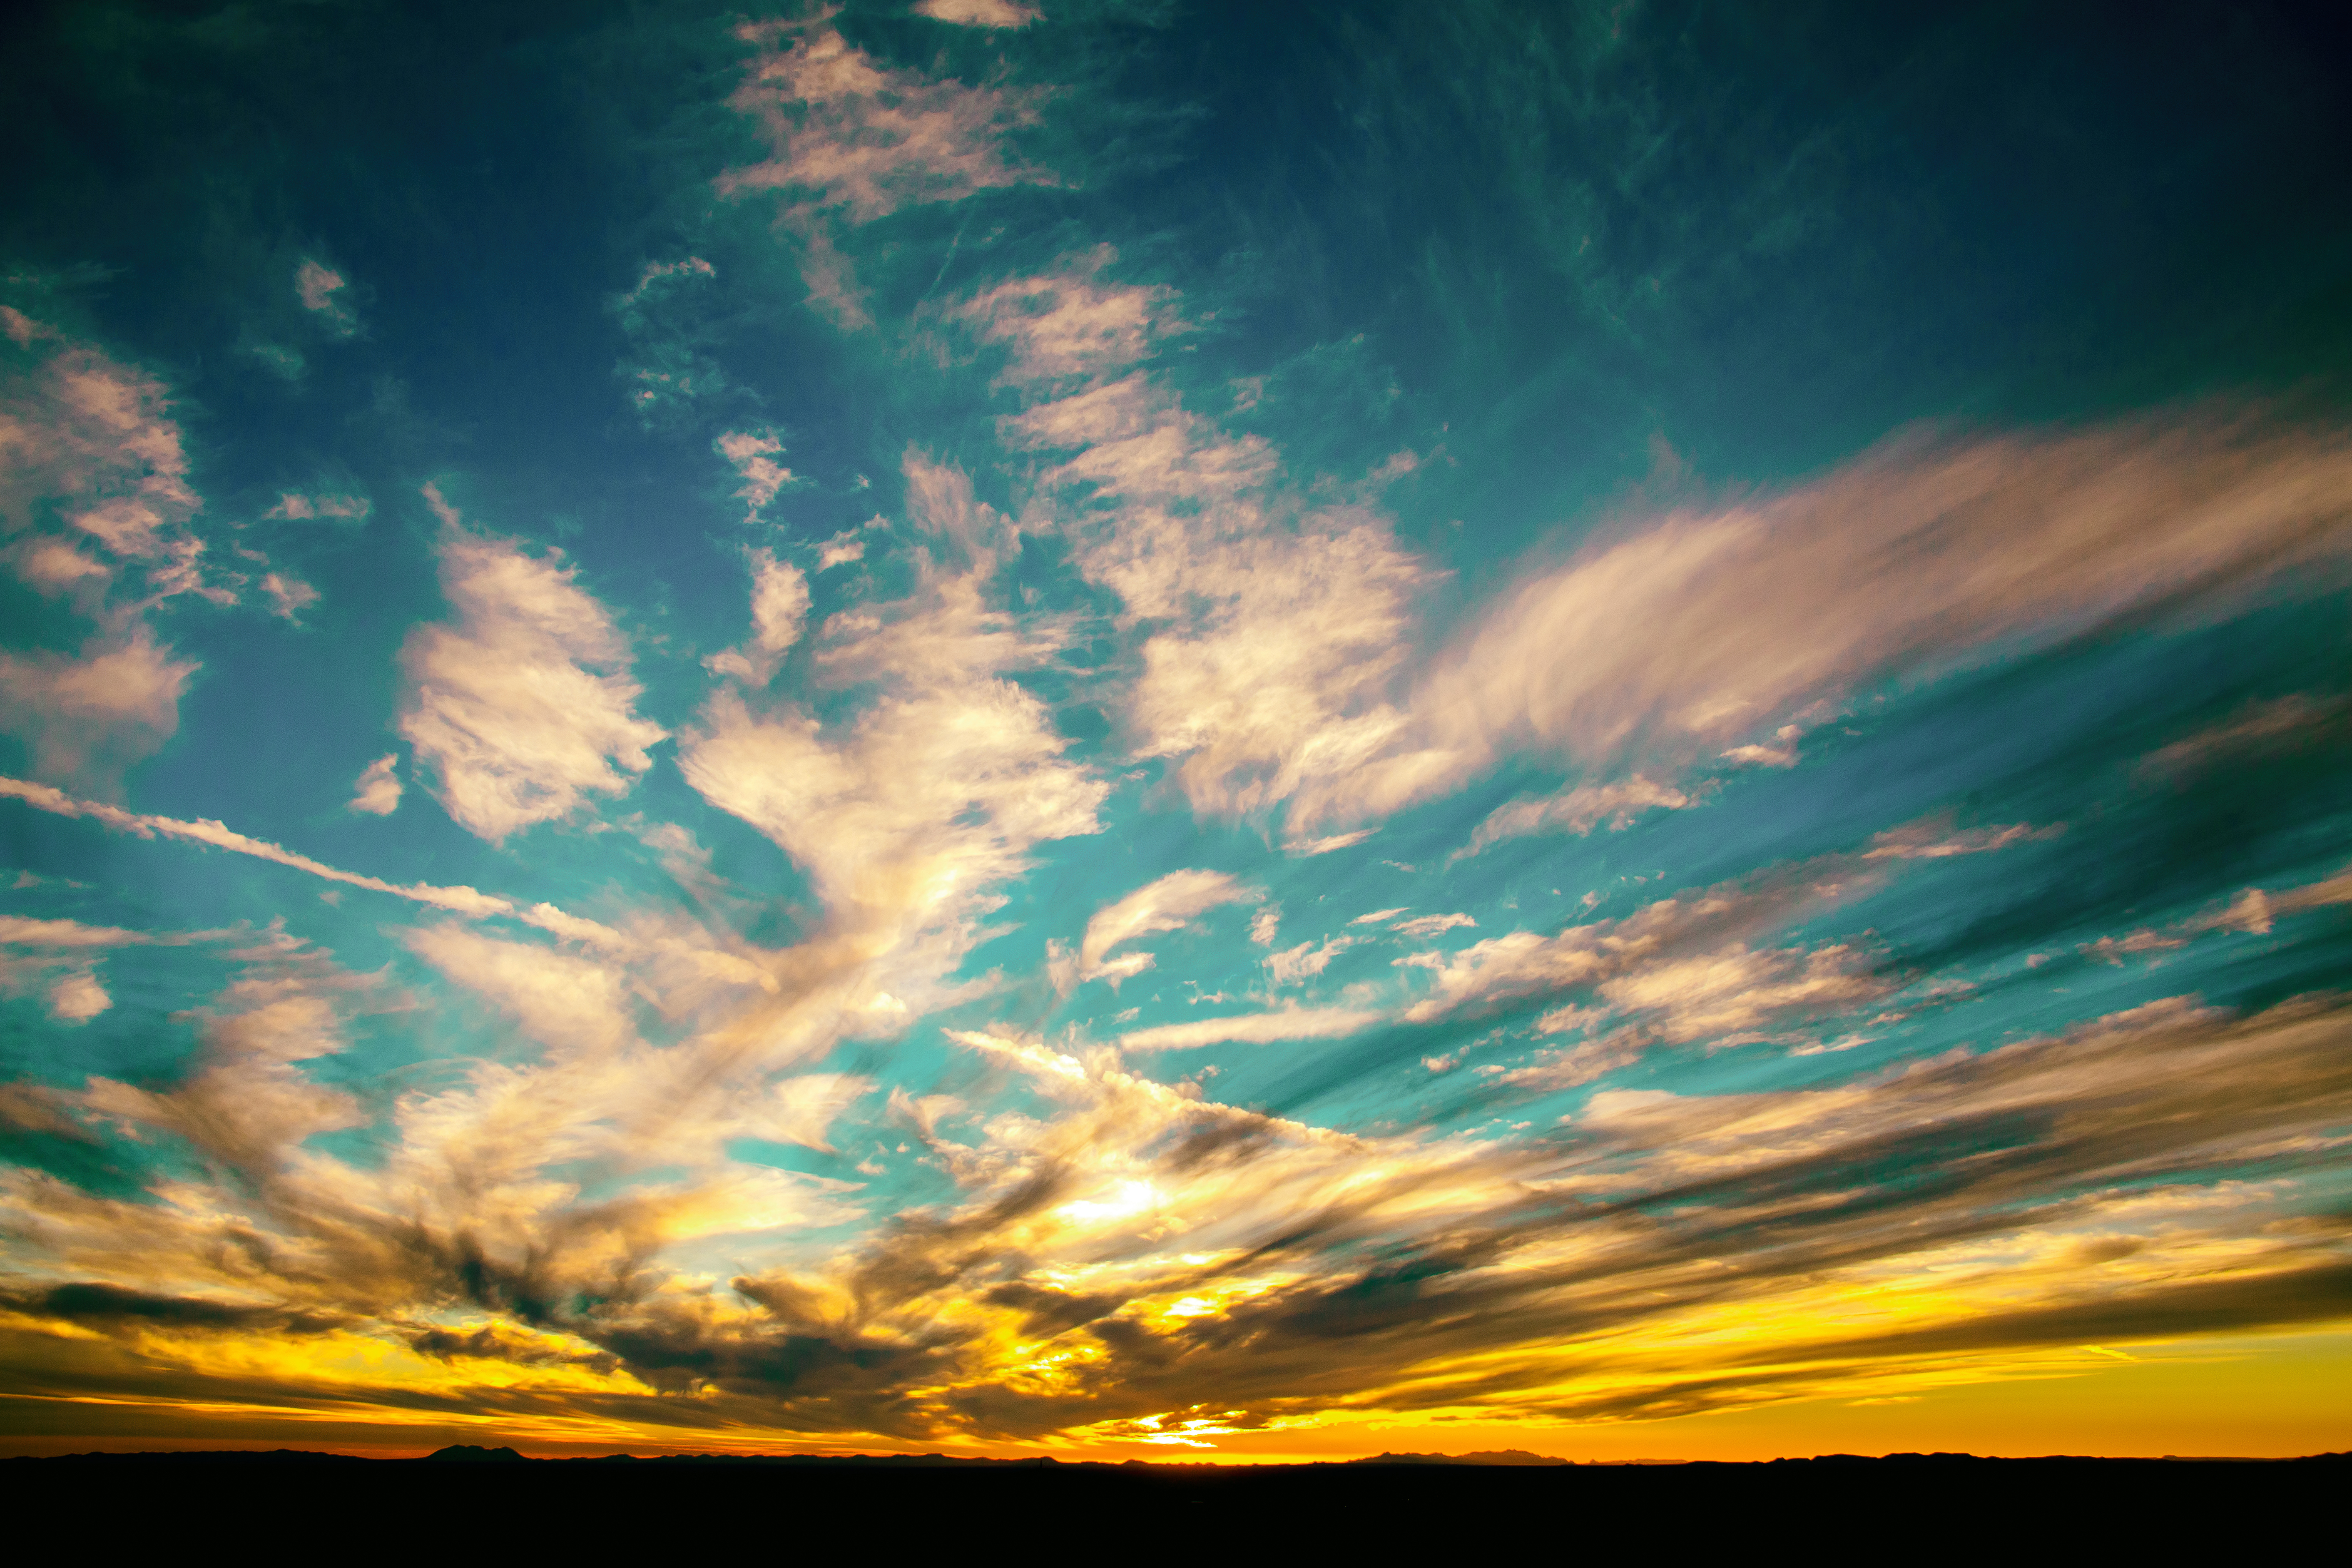 sunset sky 1579380920 - Sunset Sky - Sunset Sky wallpapers 4k, Sunset Sky wallpapers, Sunset Sky 4k wallpapers